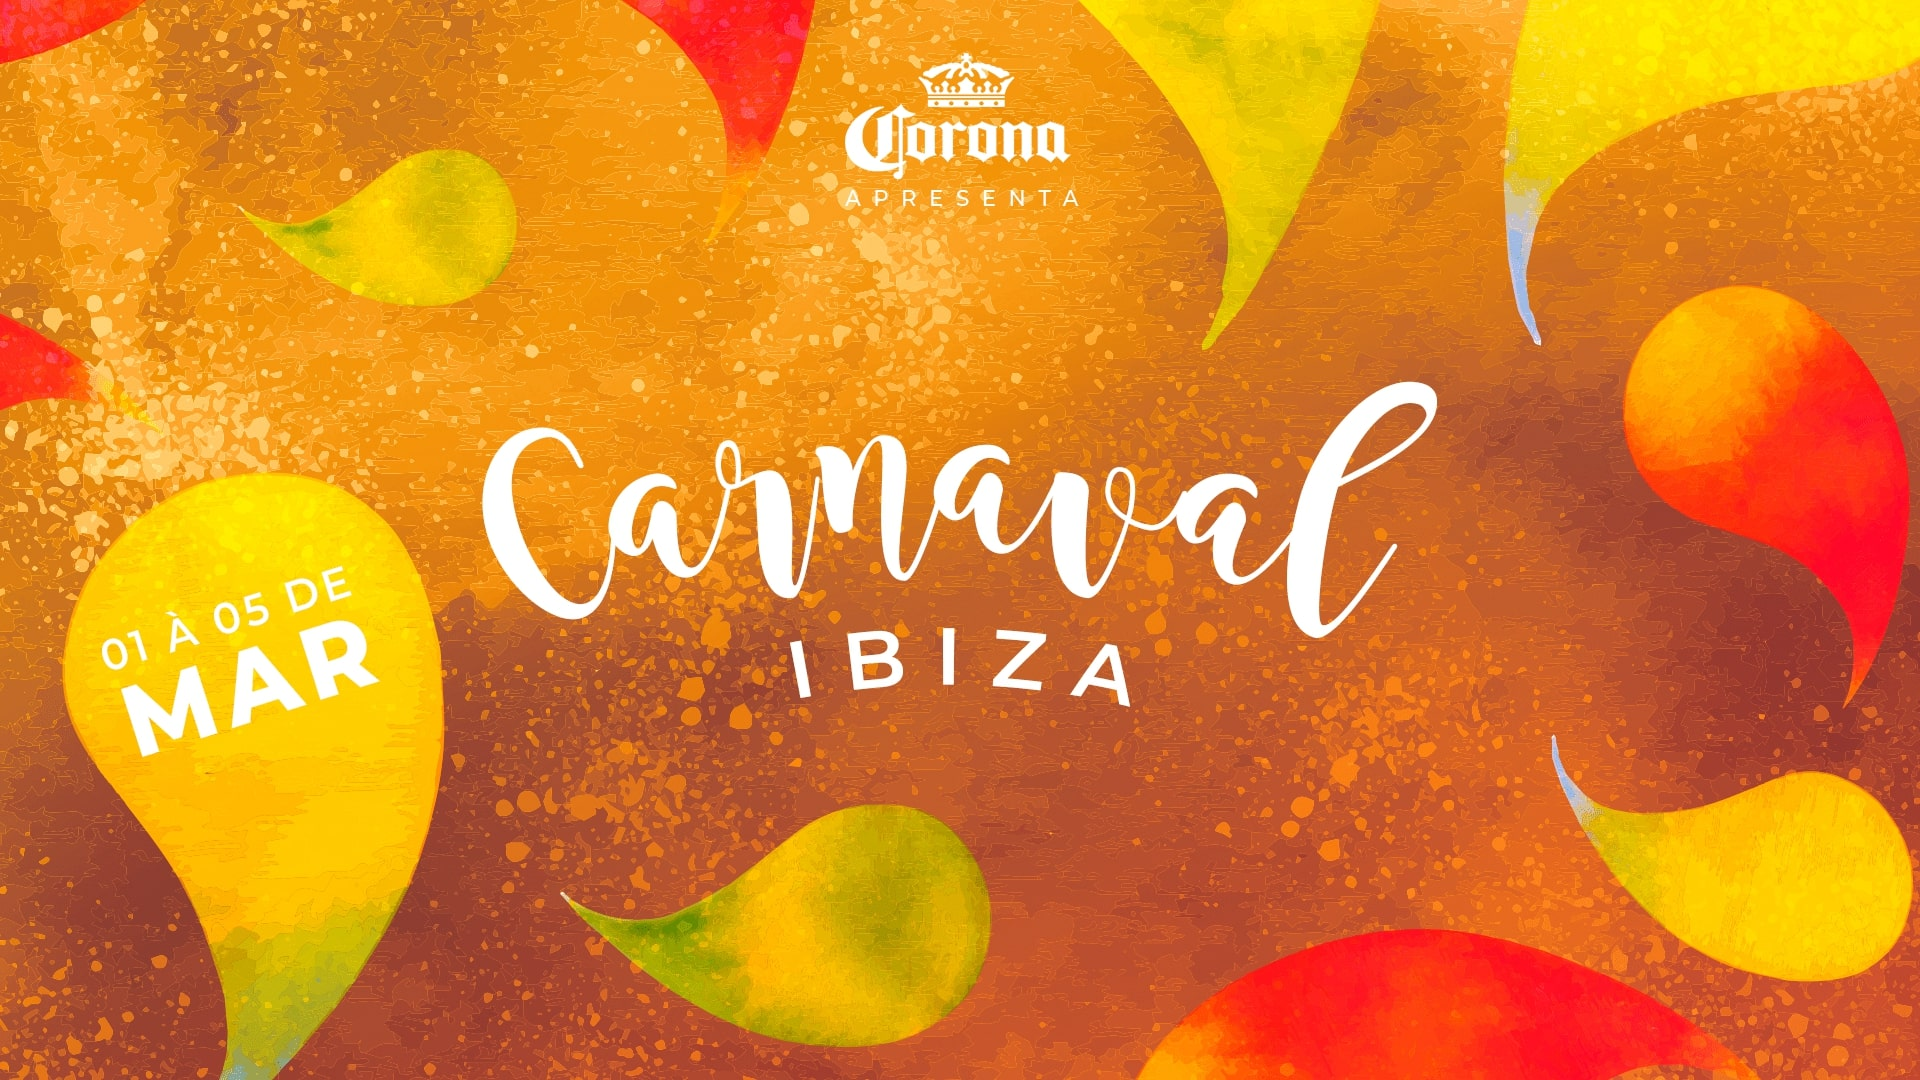 Carnaval Ibiza